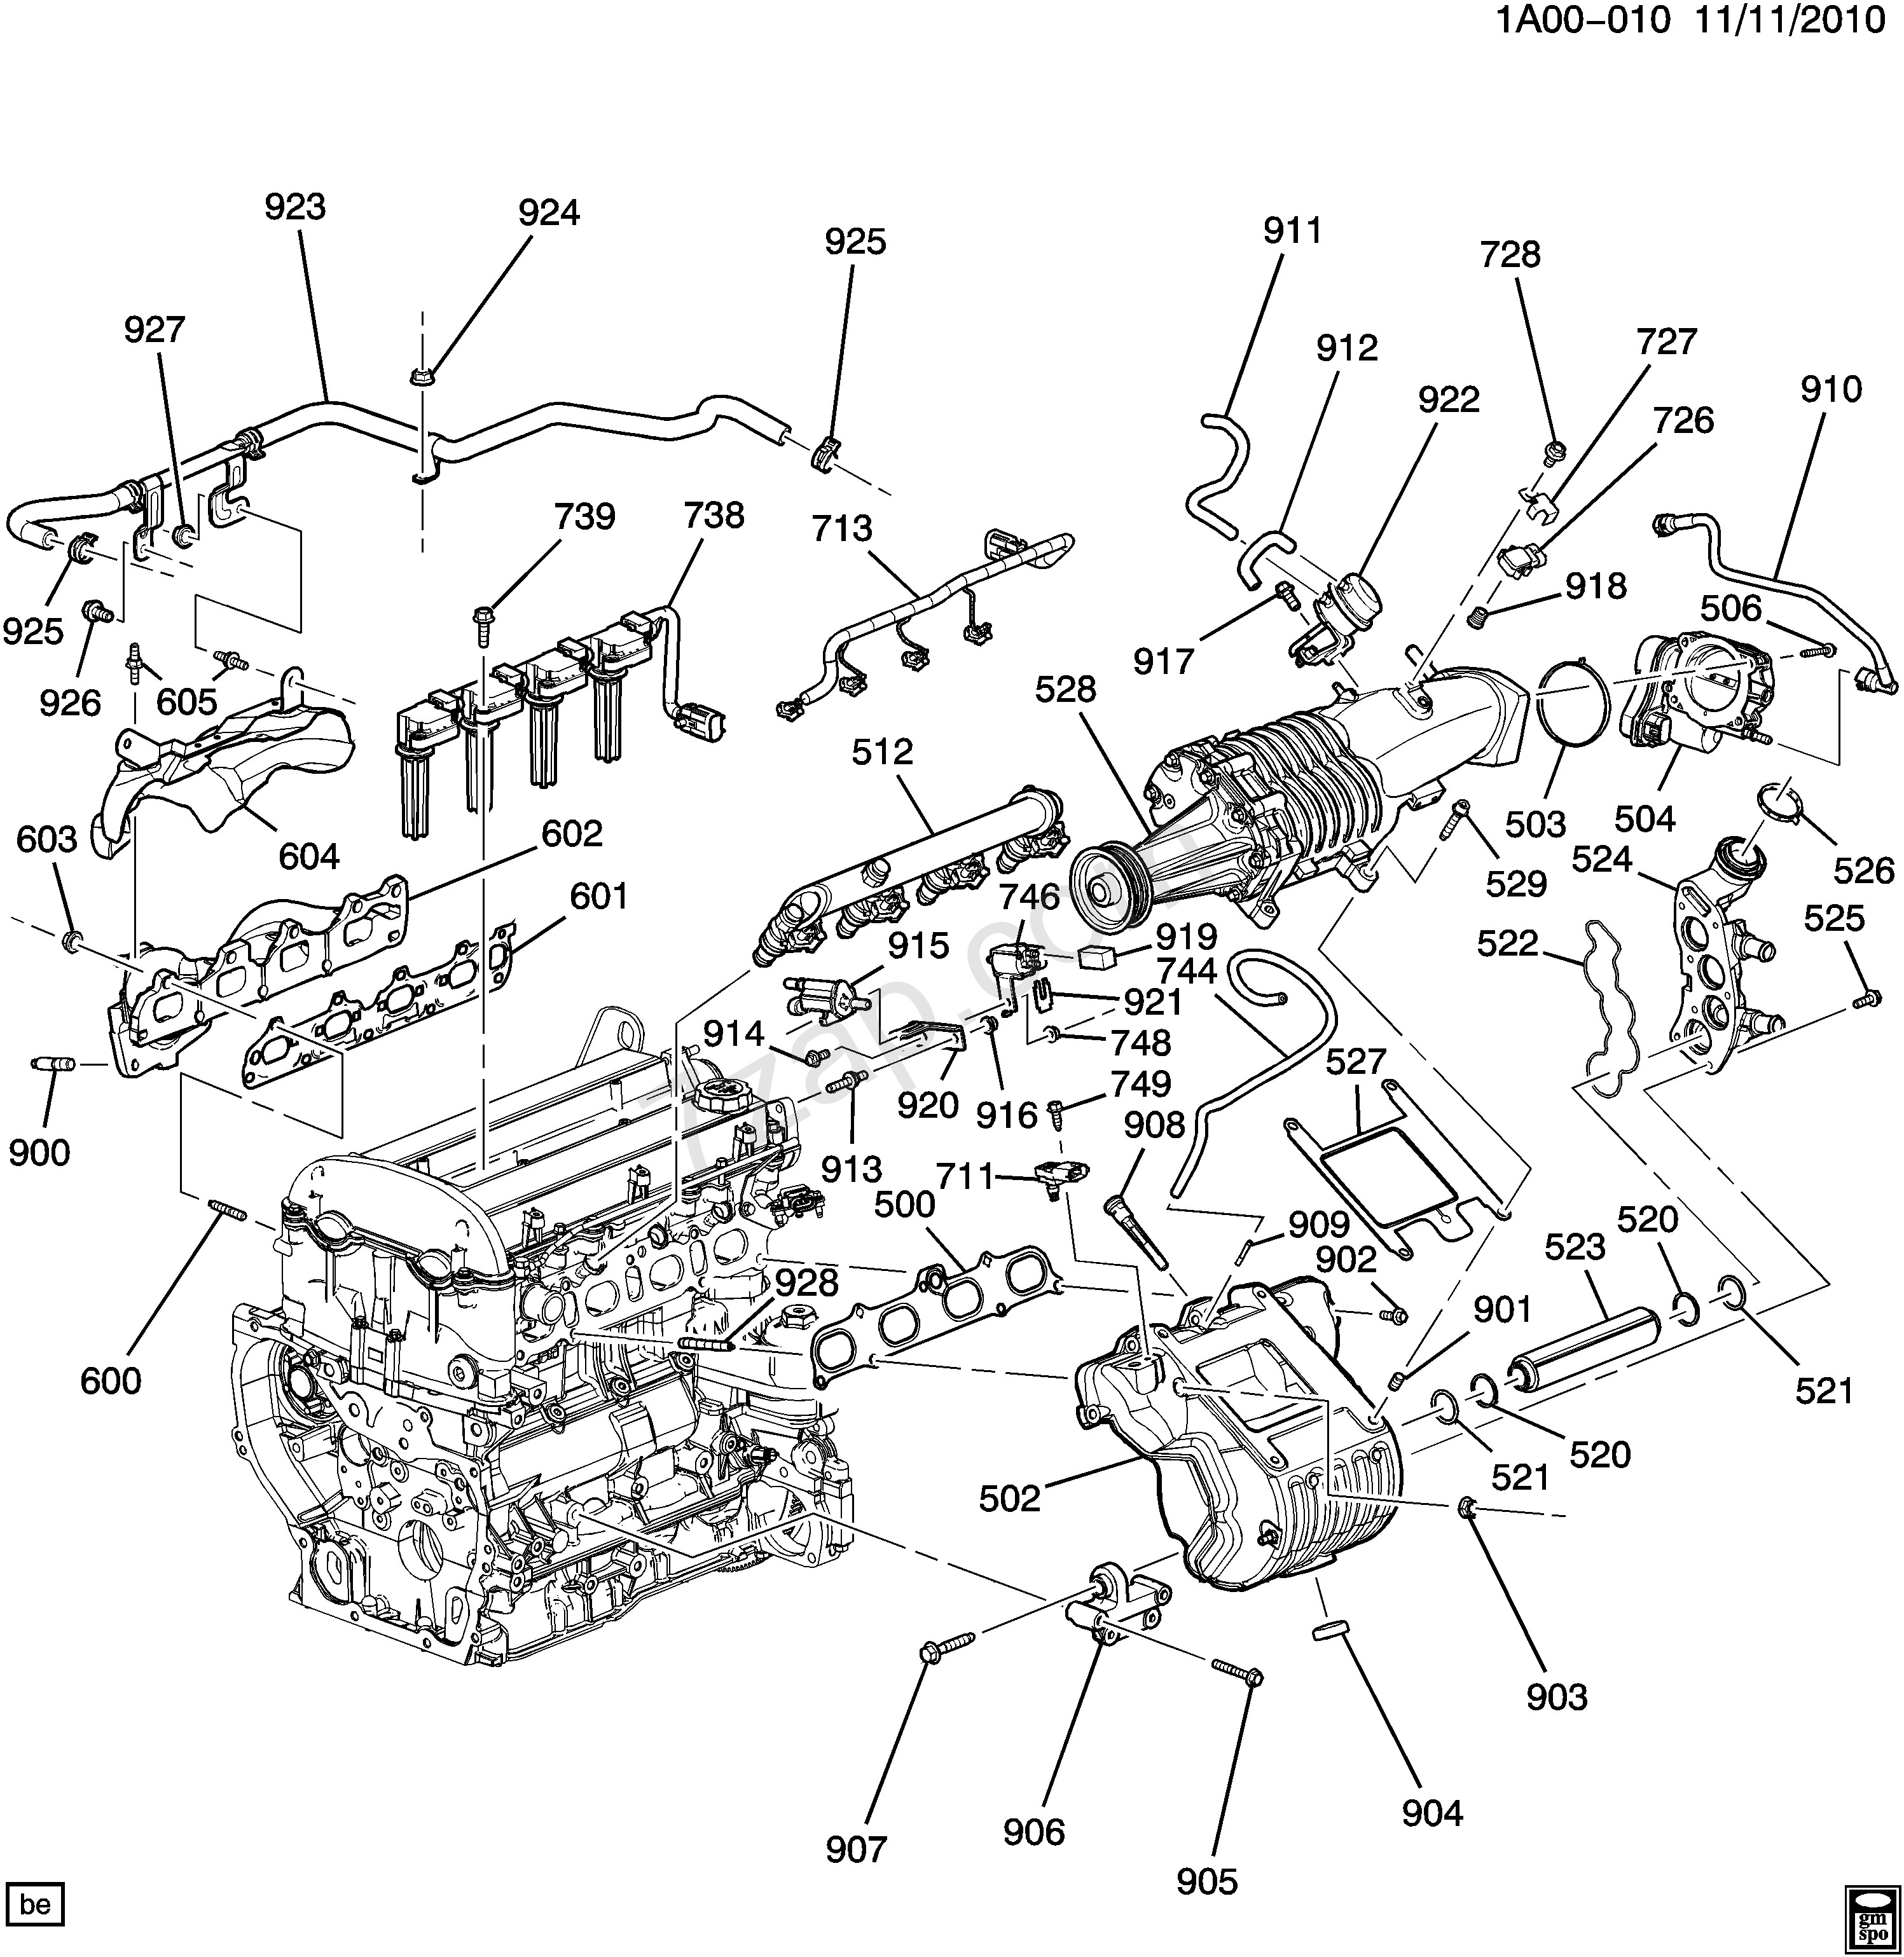 Spitronics Iron 4 Cylinder Wiring Diagram Gm Iron Duke Engine Diagram Wiring Diagrams Of Spitronics Iron 4 Cylinder Wiring Diagram